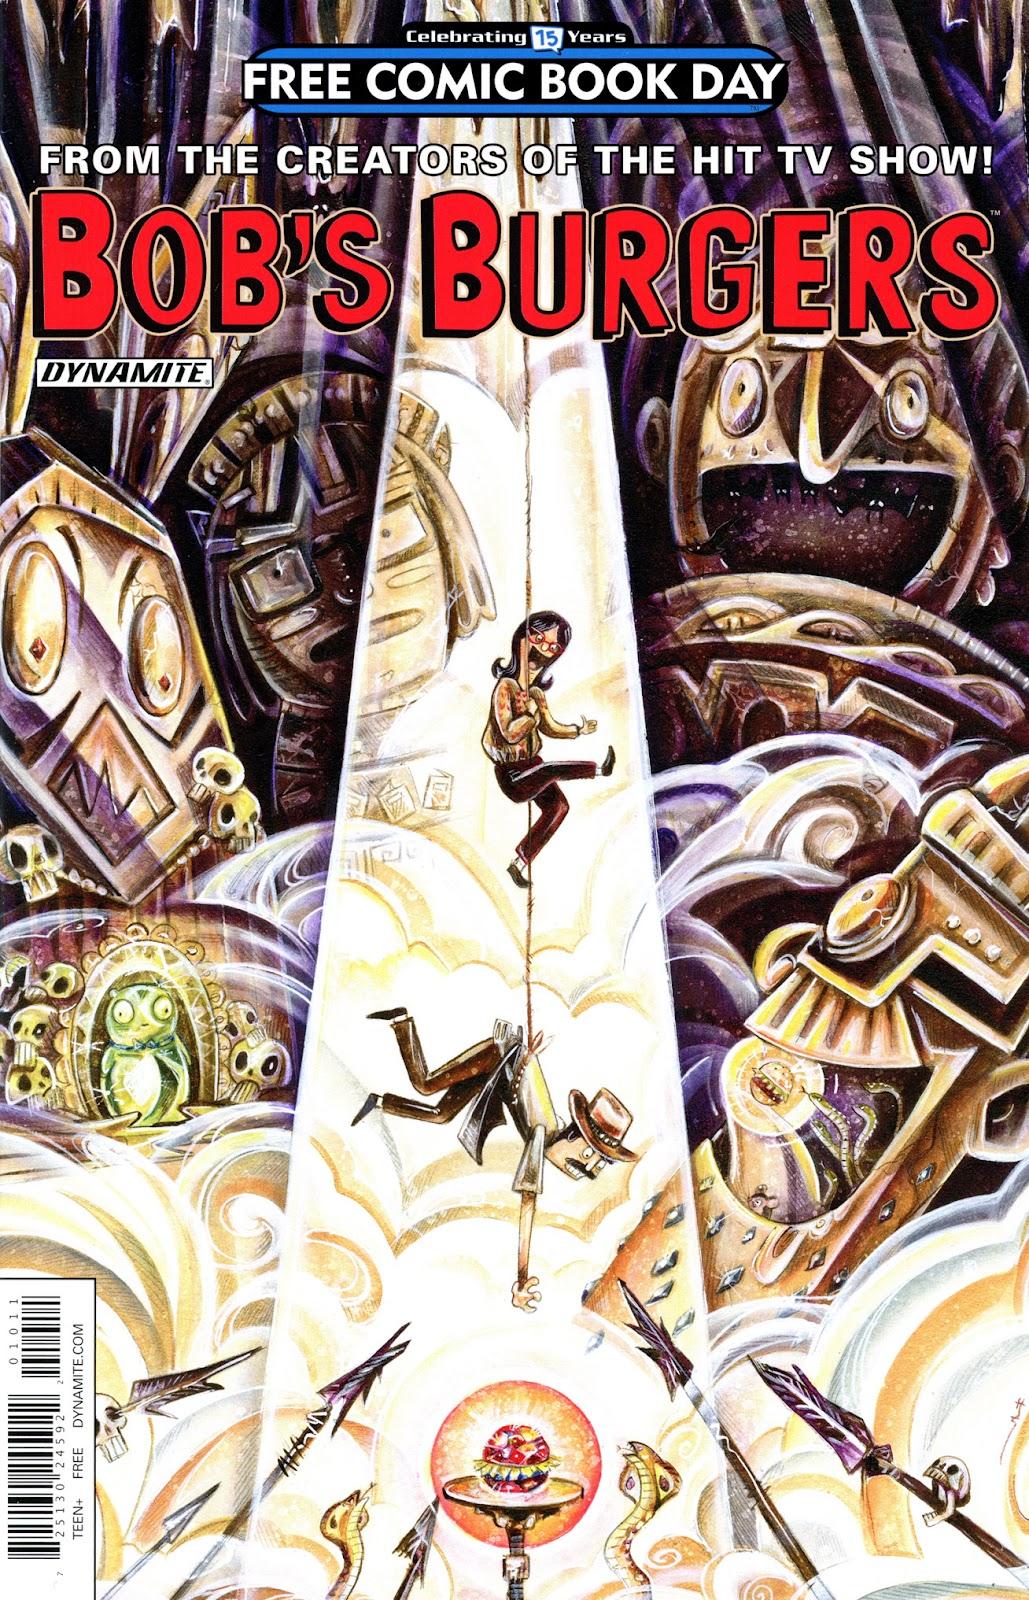 Bobs Burgers - FCBD 2016 Full Page 1